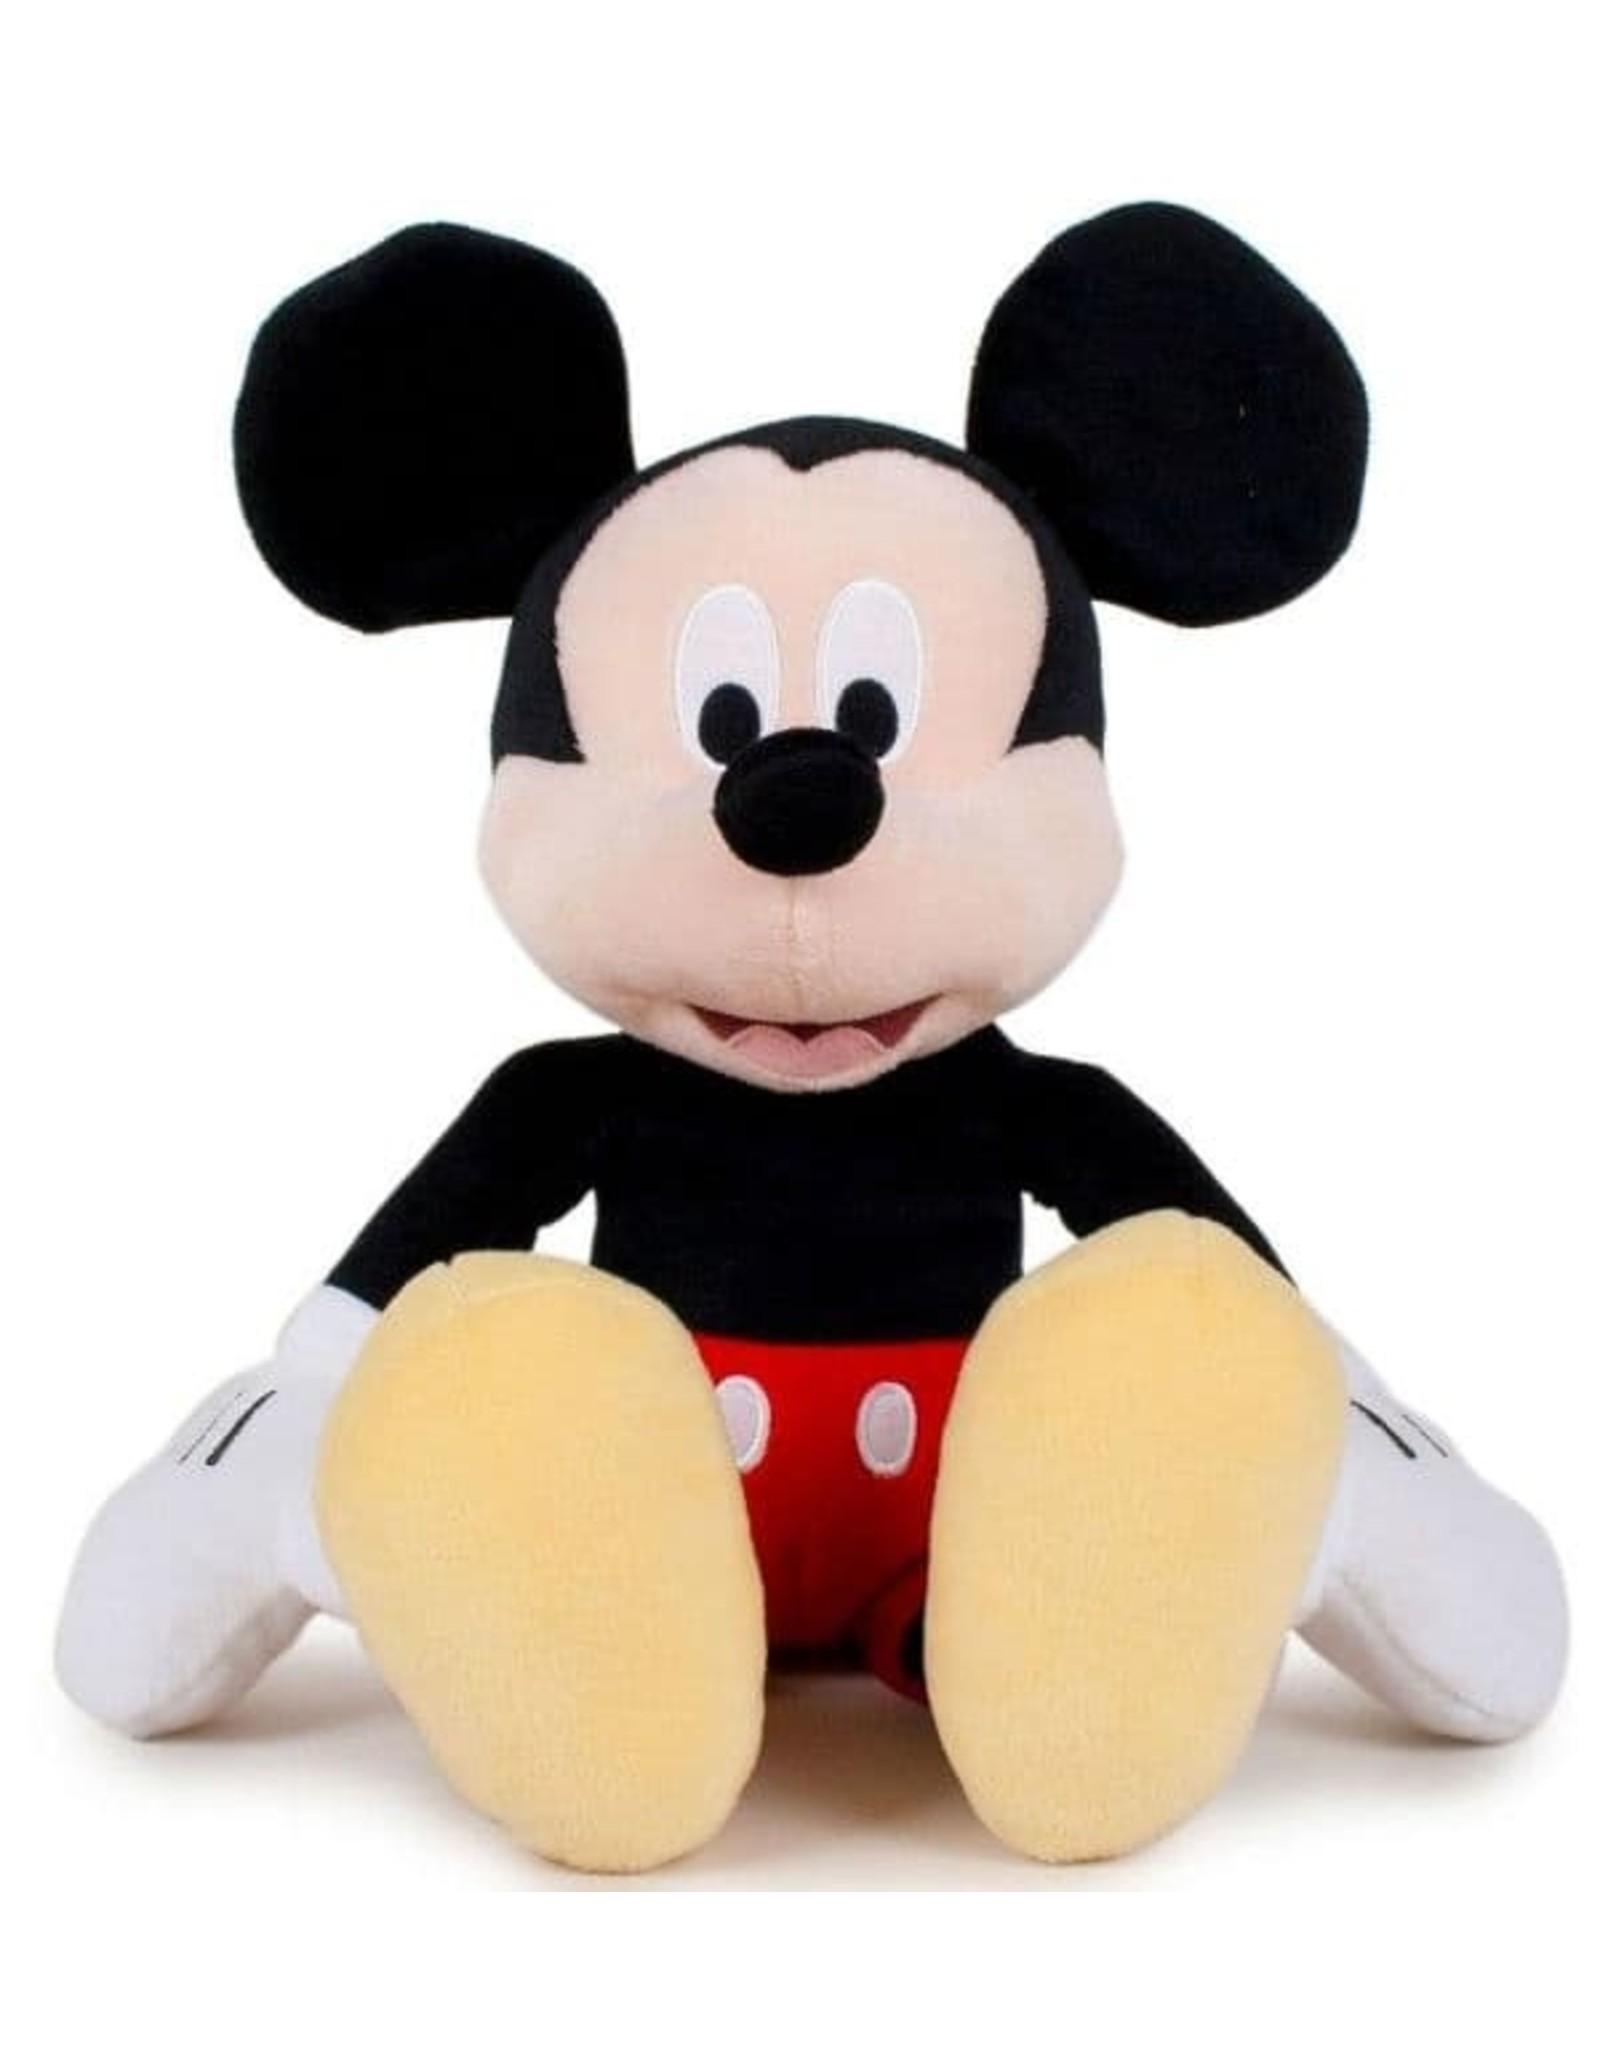 Disney Merchandise plush and figurines - Disney plush Mickey Mouse 53cm